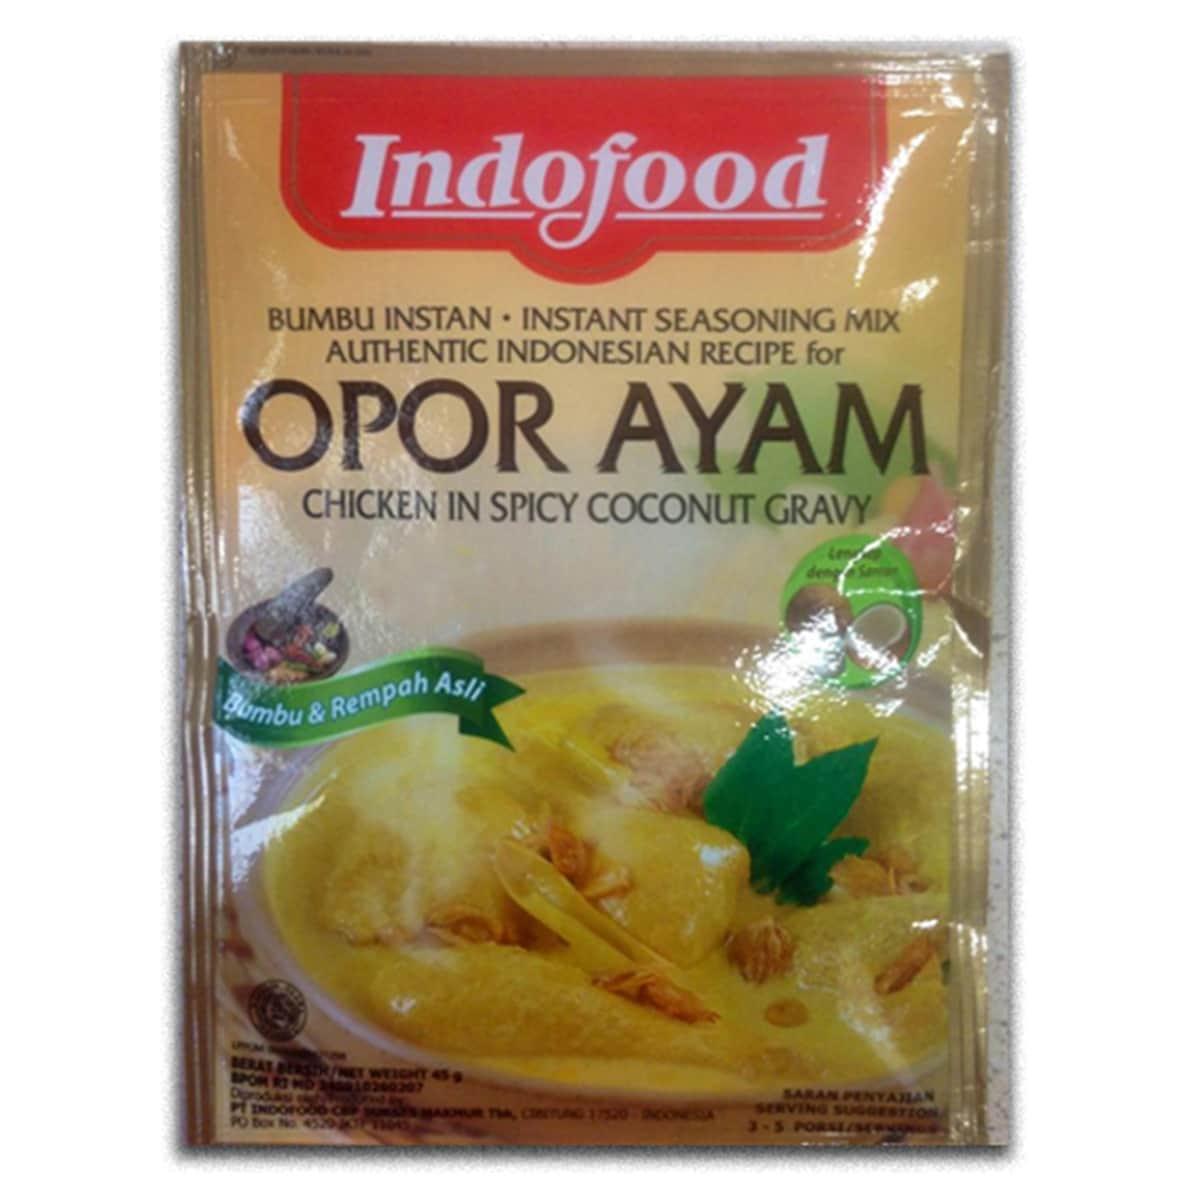 Buy Indofood Opor Ayam (Chicken in Spicy Coconut Gravy) - 45 gm